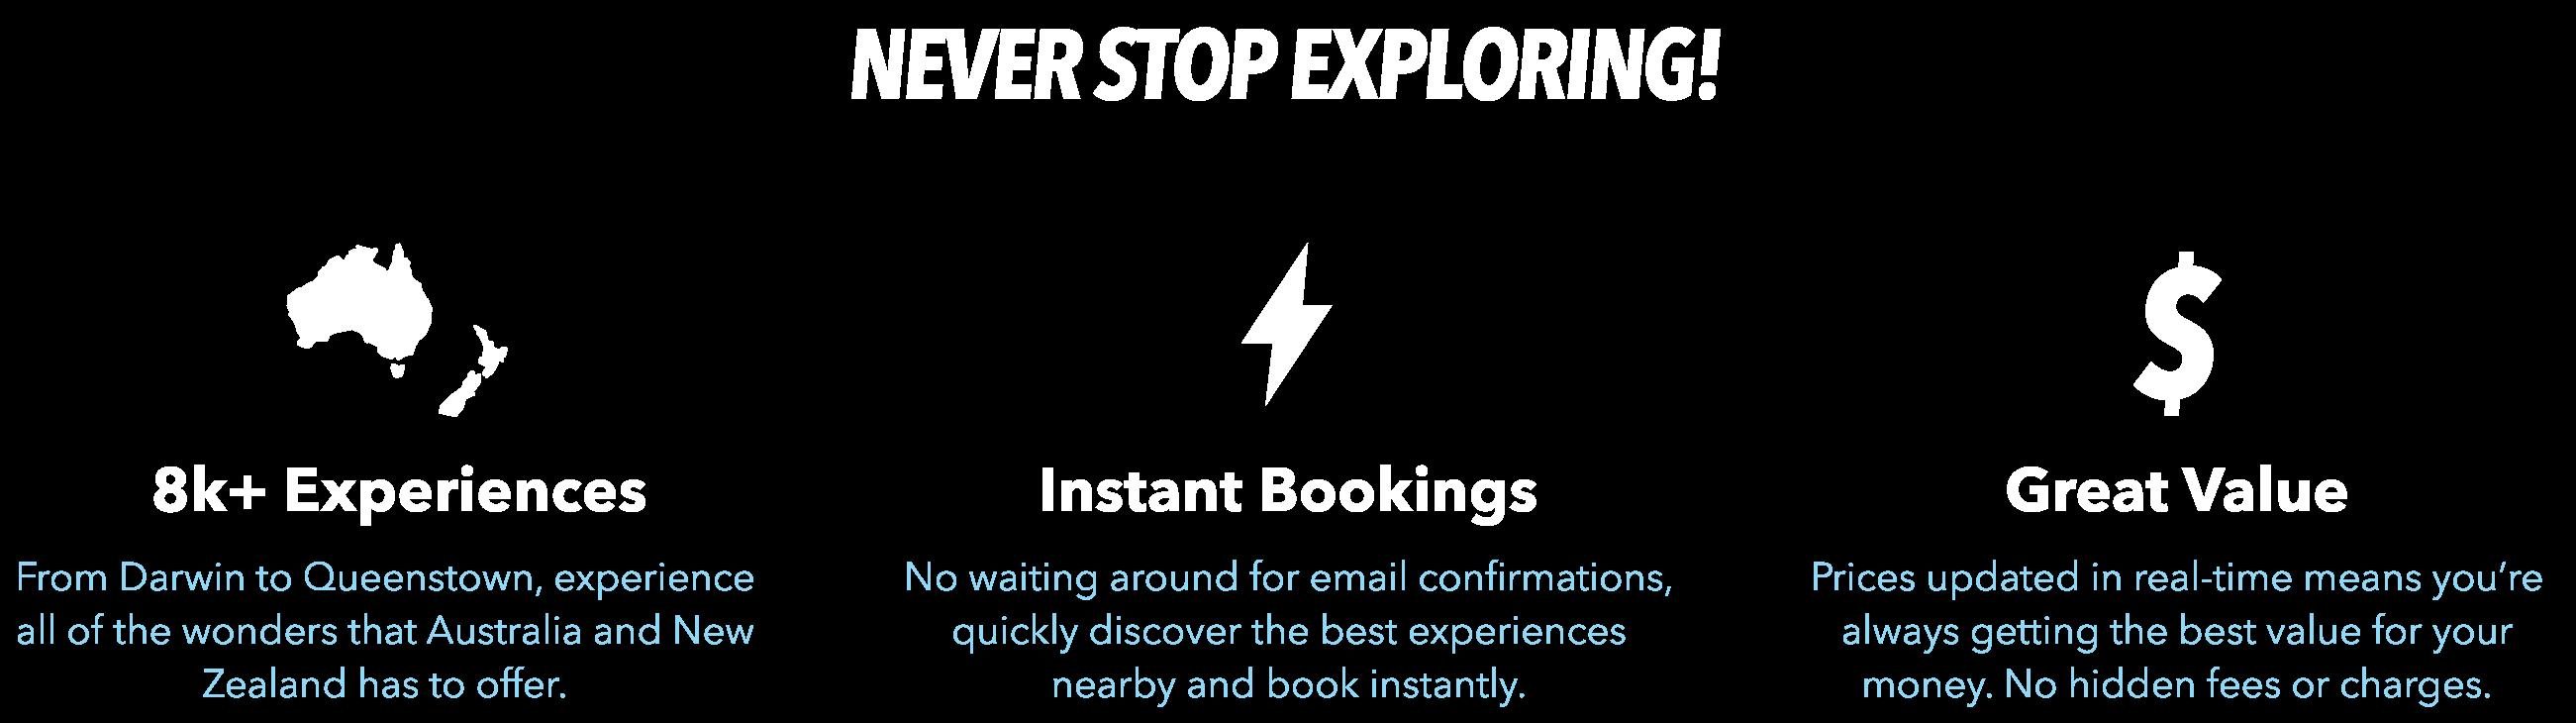 NEVER STOP EXPLORING!